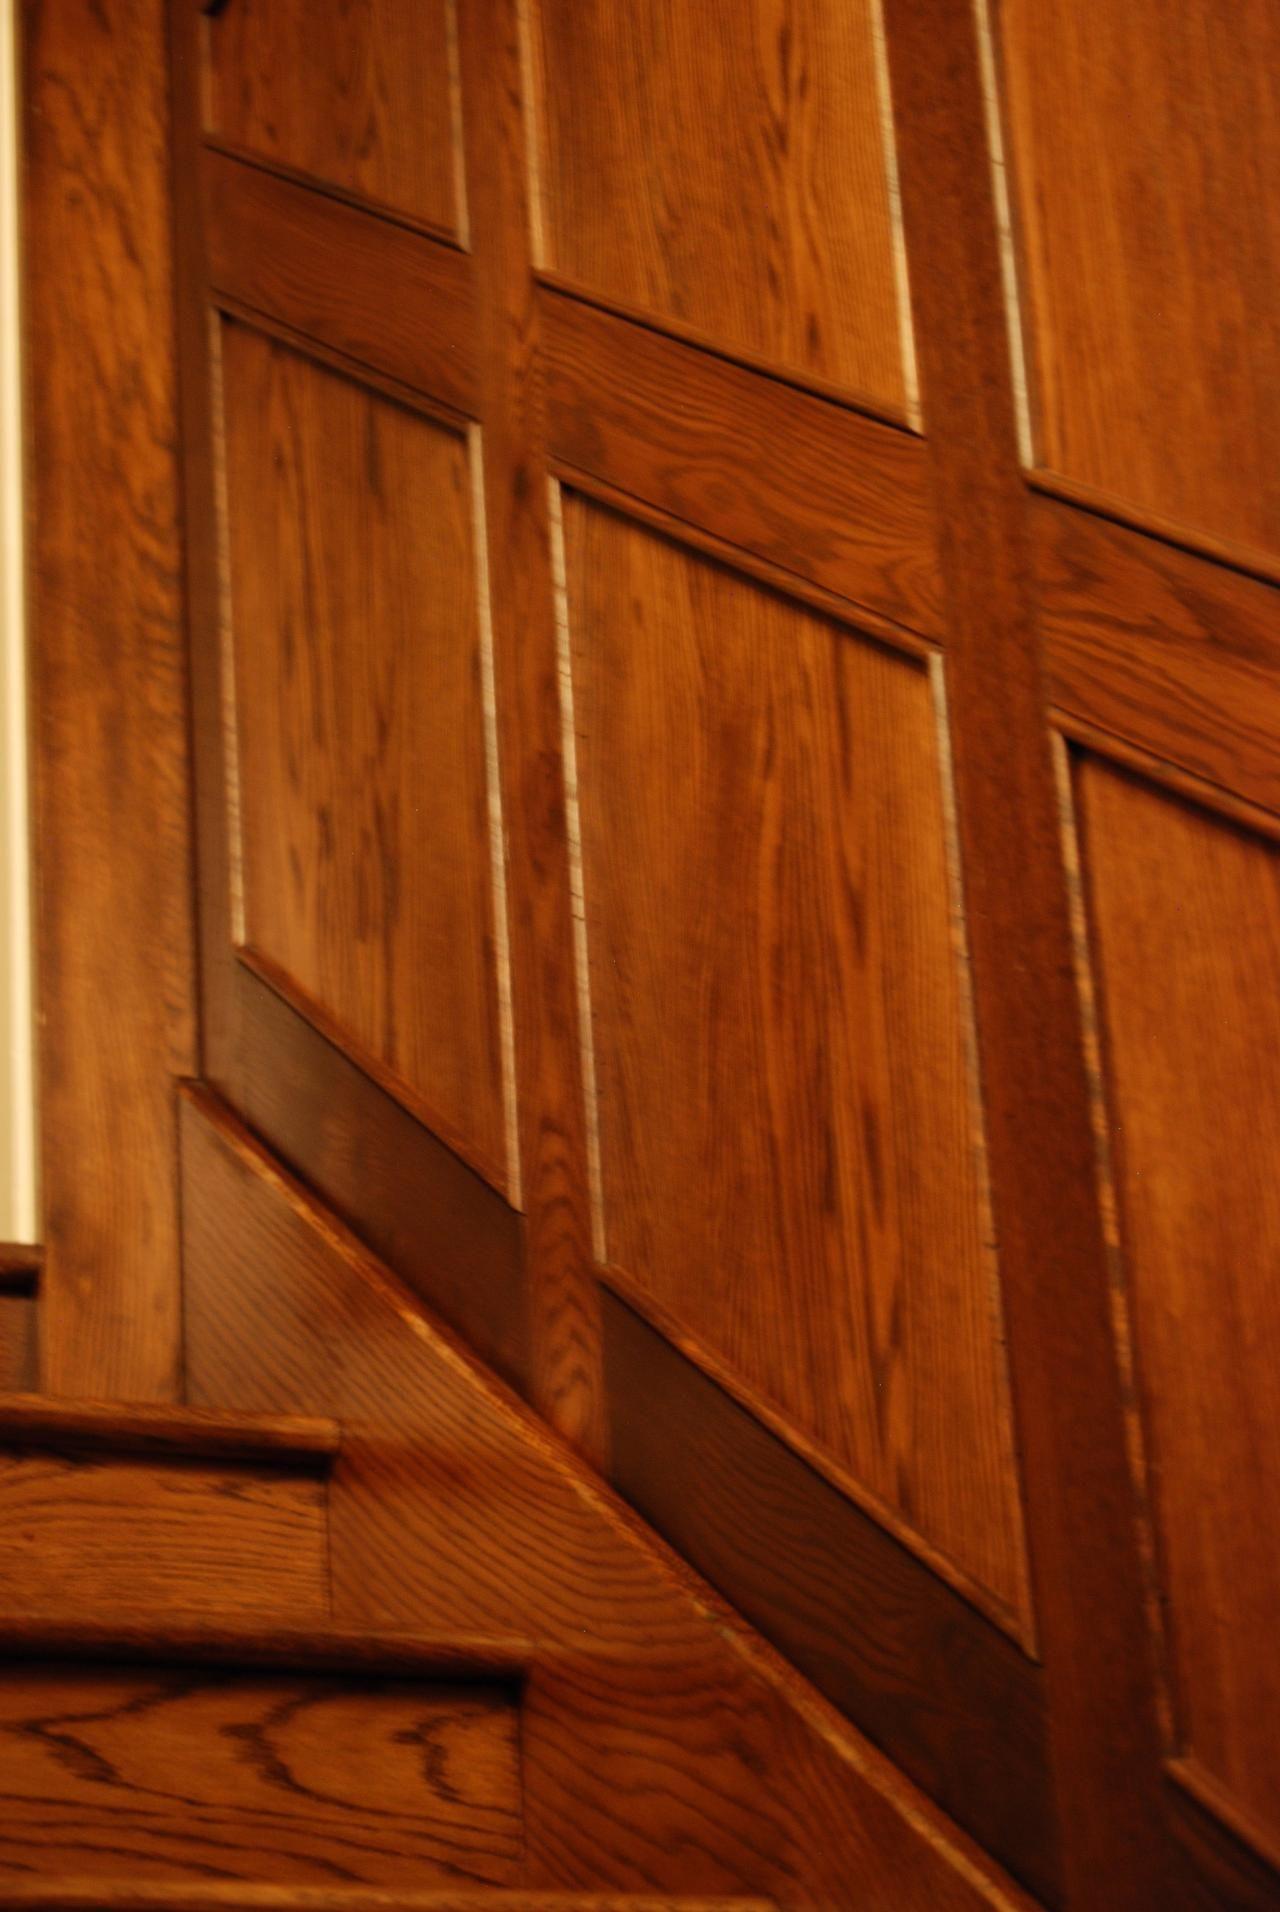 Basement Wood Paneling: Wood Panel Stairway (detail)